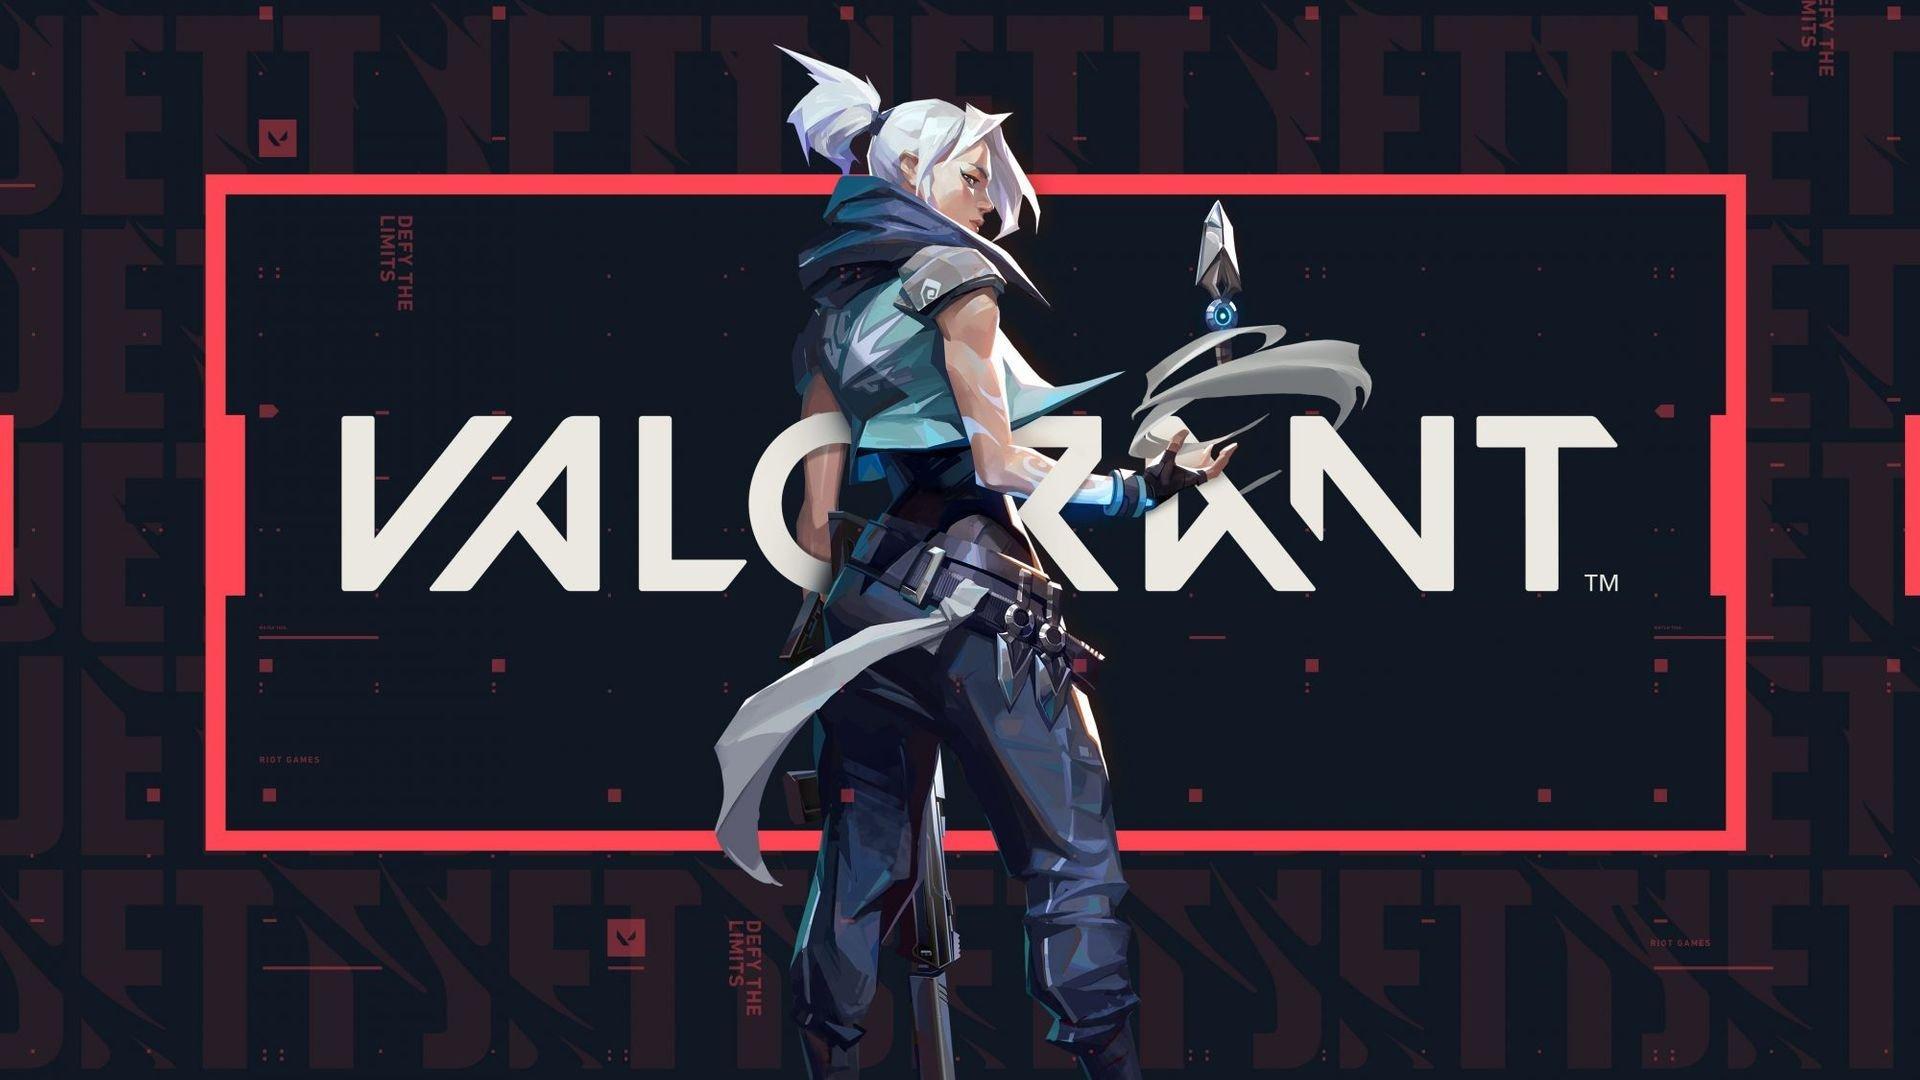 VALORANT_Jett_Type-2000x1125.jpg